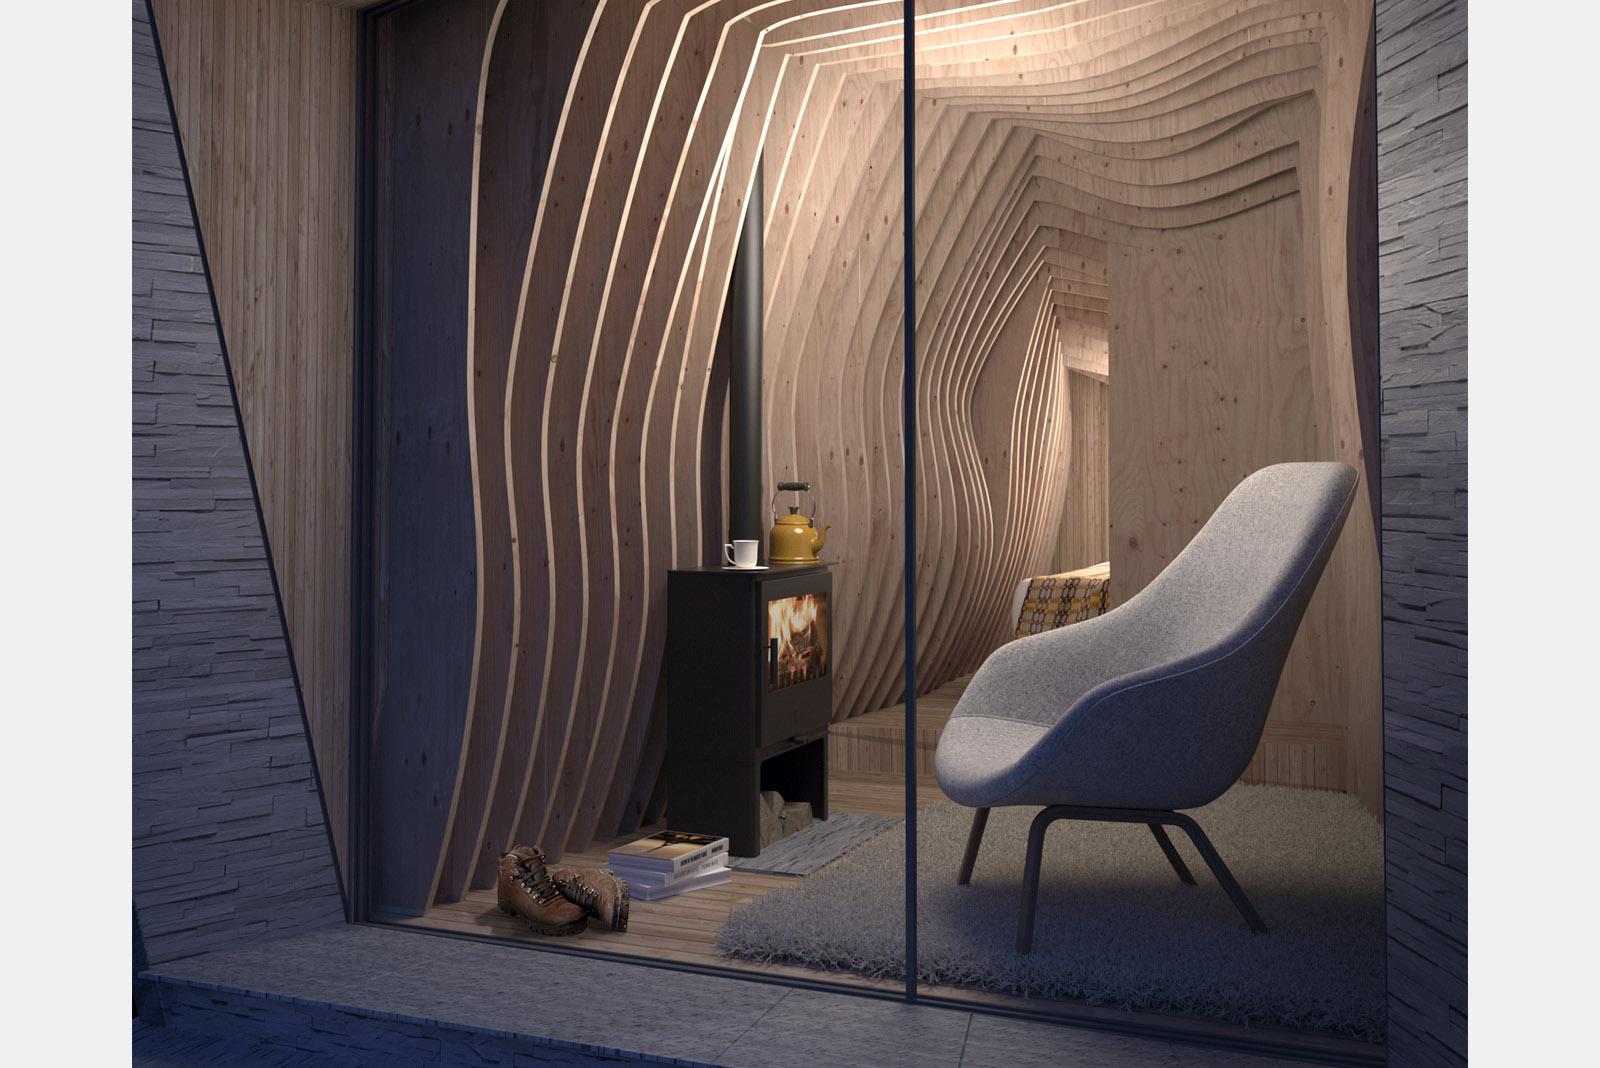 mka-architects-arthurs-cave-2